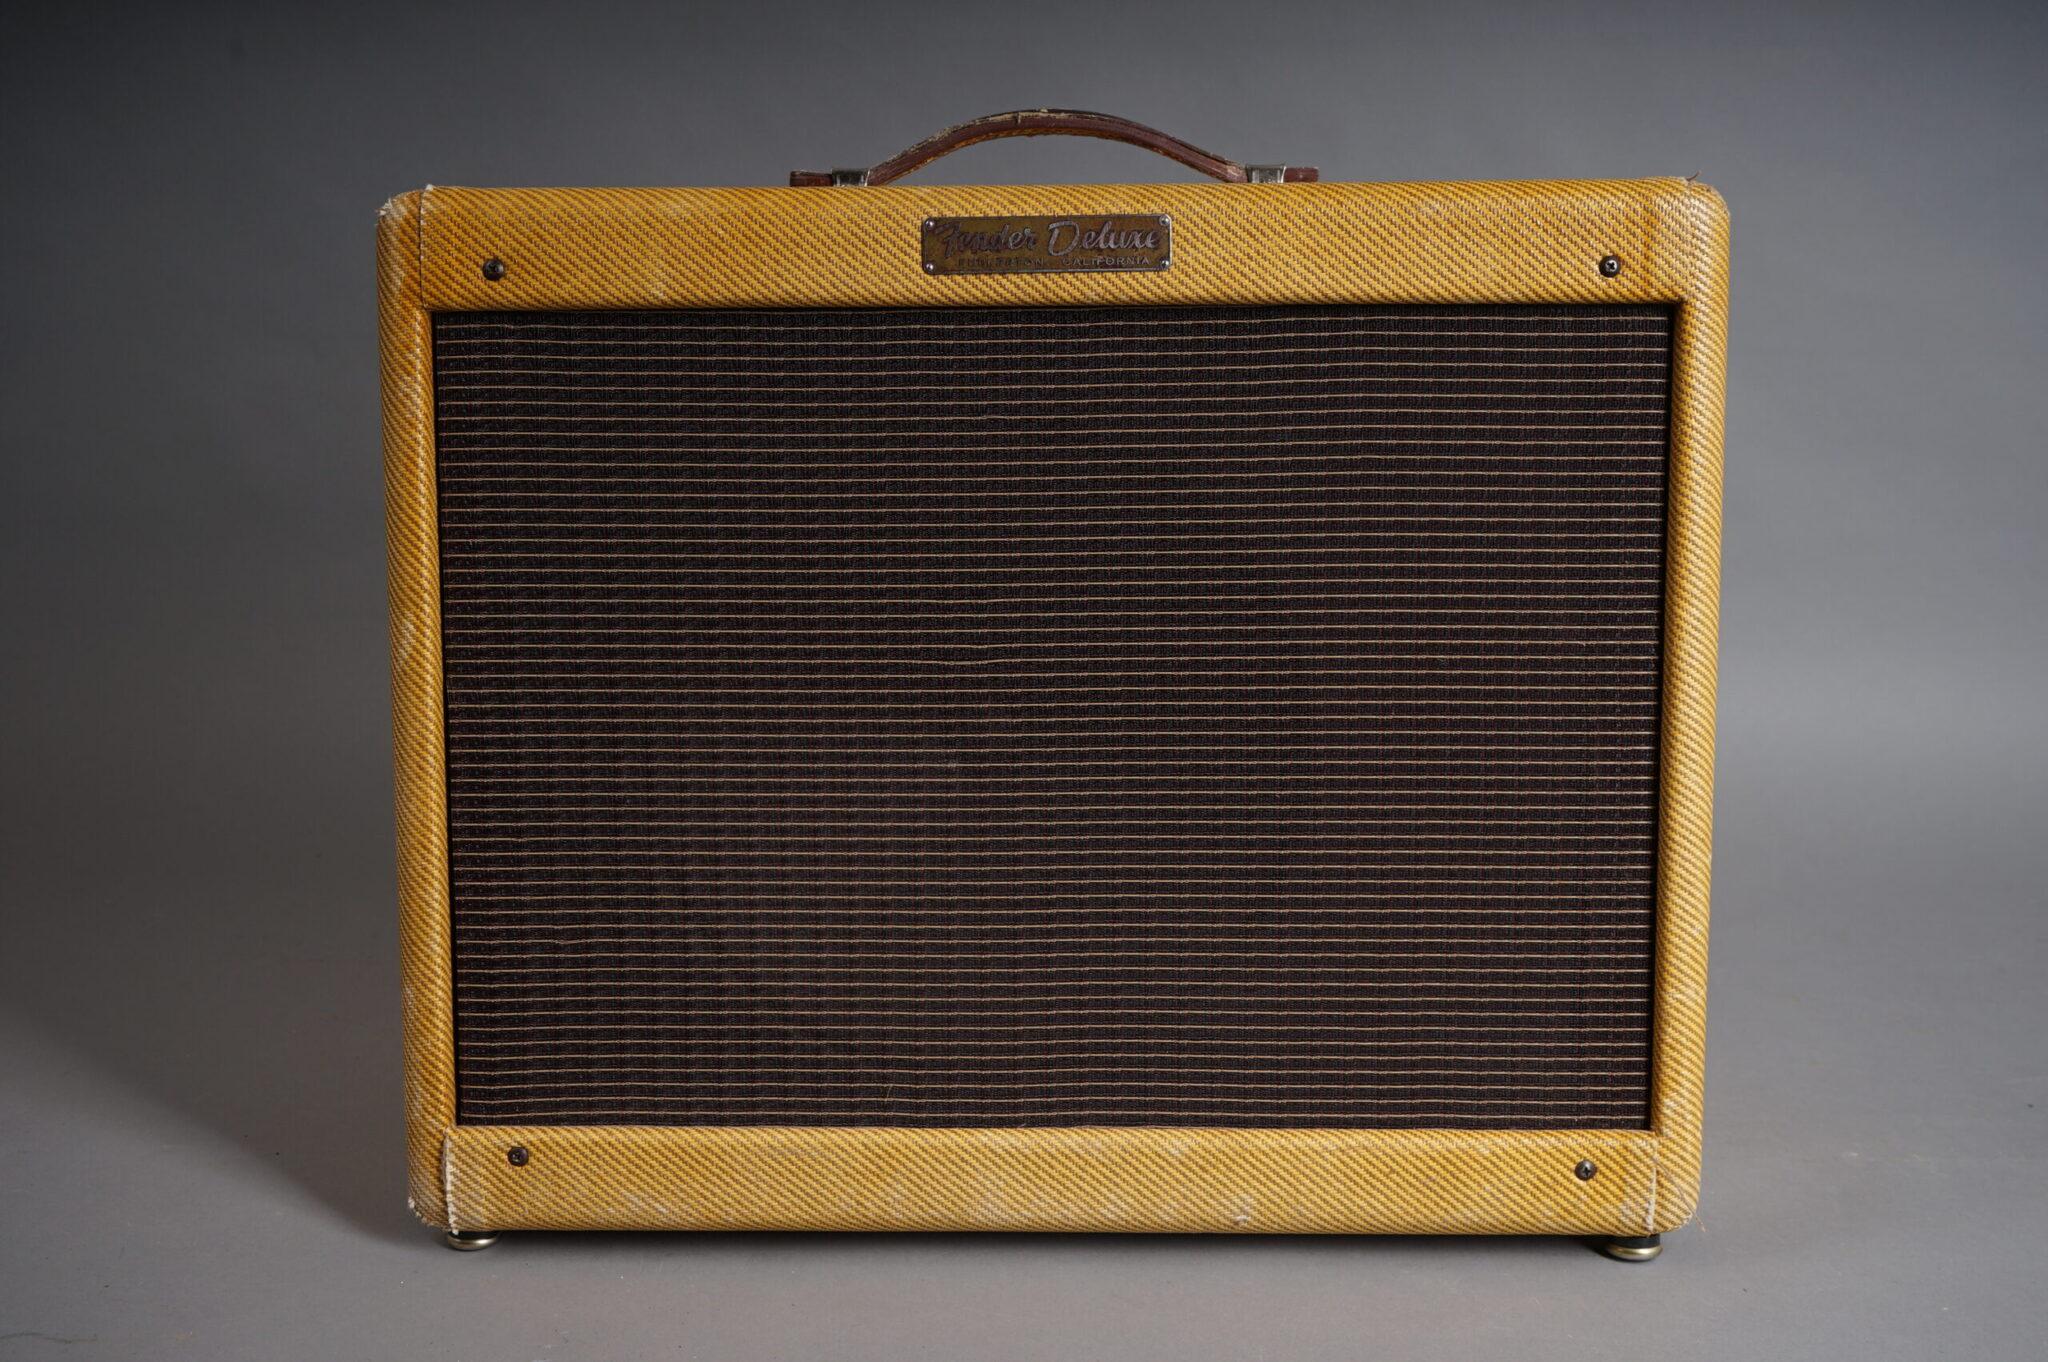 https://guitarpoint.de/app/uploads/products/1957-fender-deluxe-5e3-amp-tweed/1957-Fender-Deluxe-5E3-D-03494-2-scaled-2048x1362.jpg